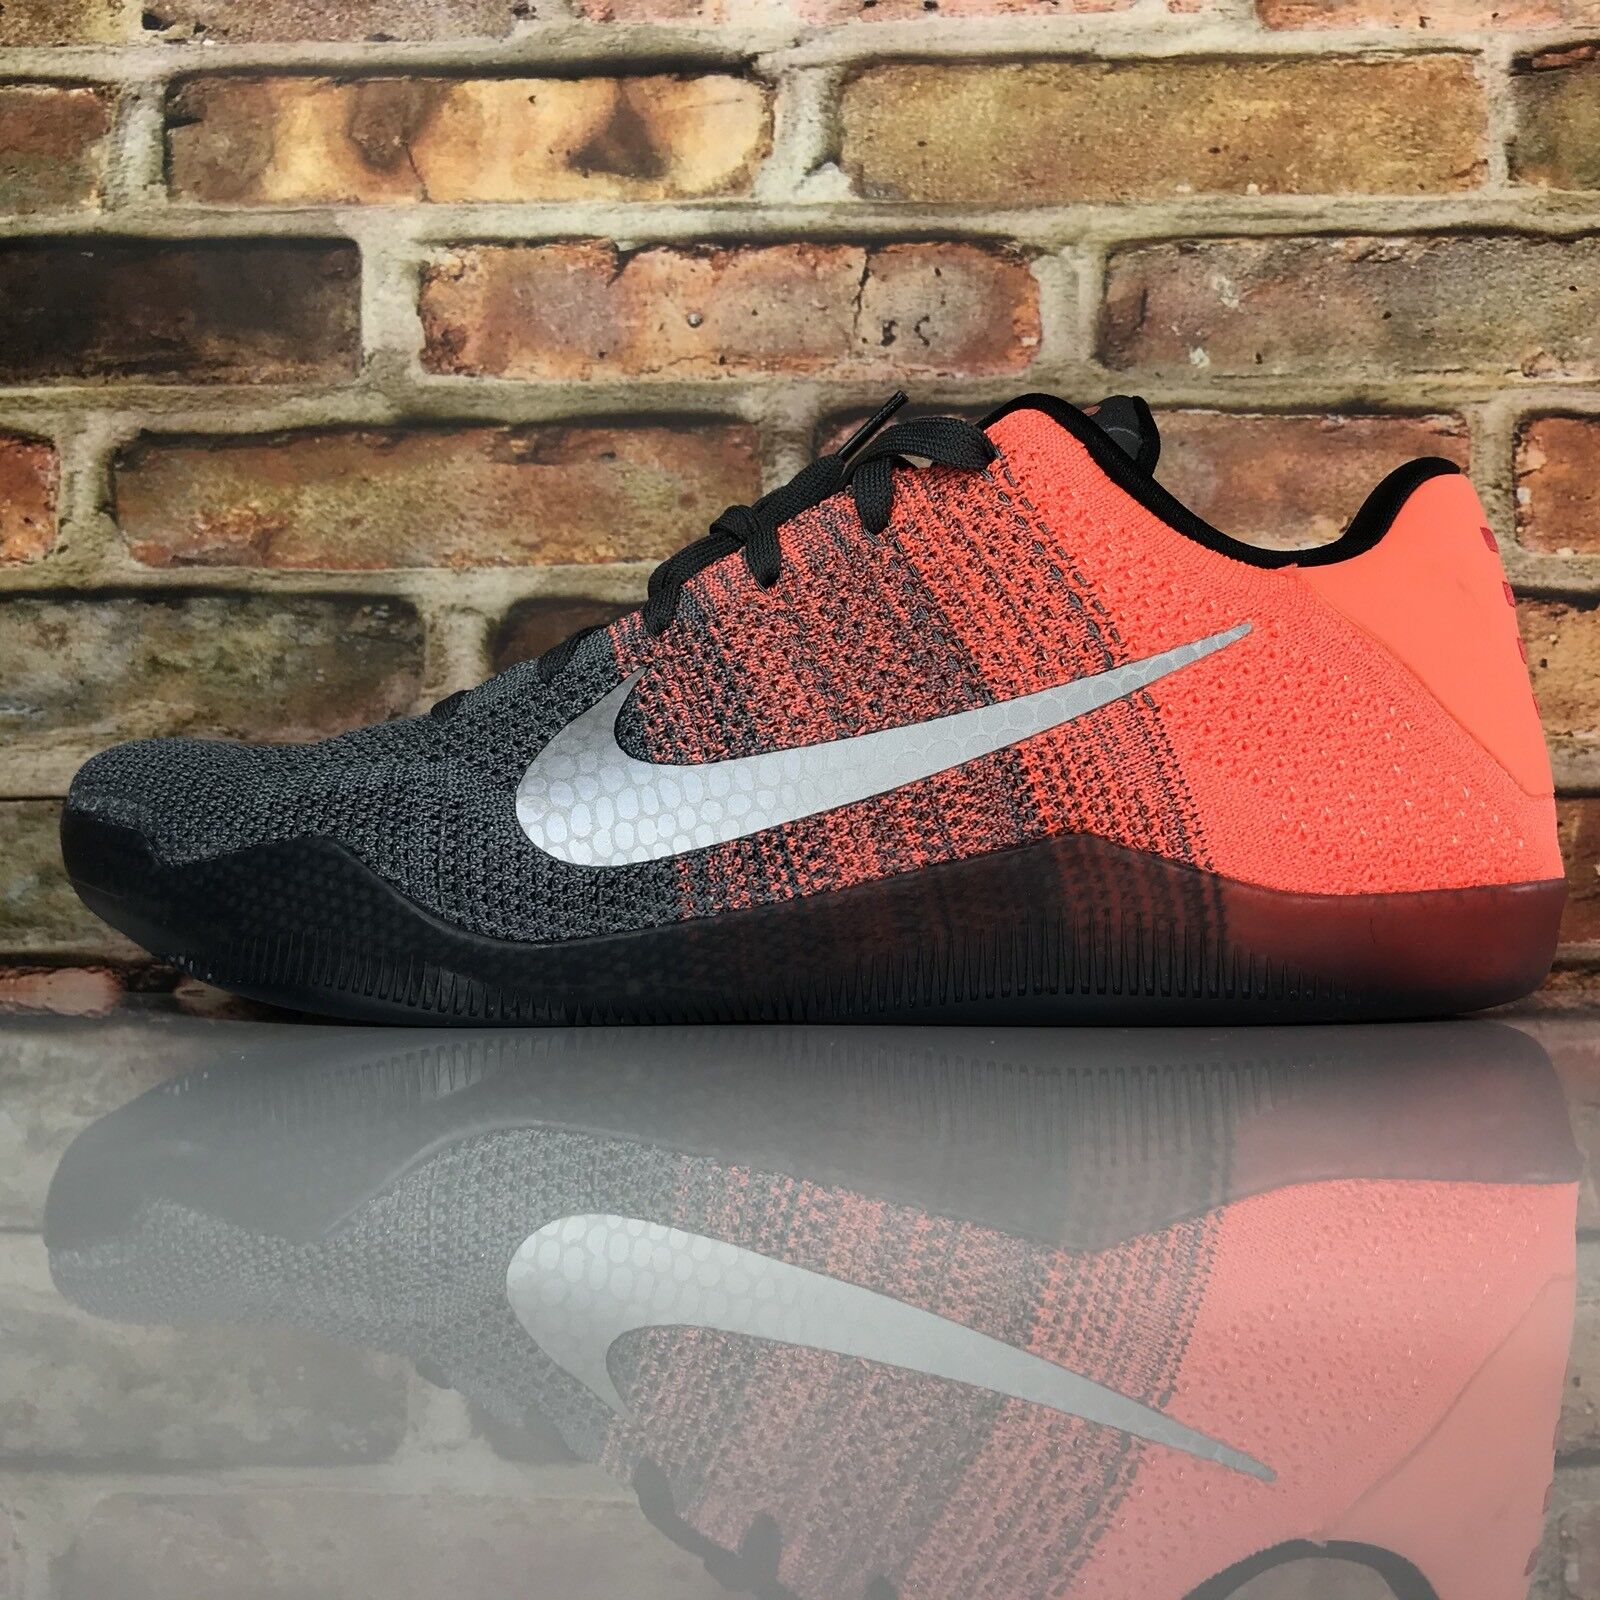 Nike Kobe XI 11 Elite Low Easter Mens Size 13 Dark Grey Bright Mango 822675-078